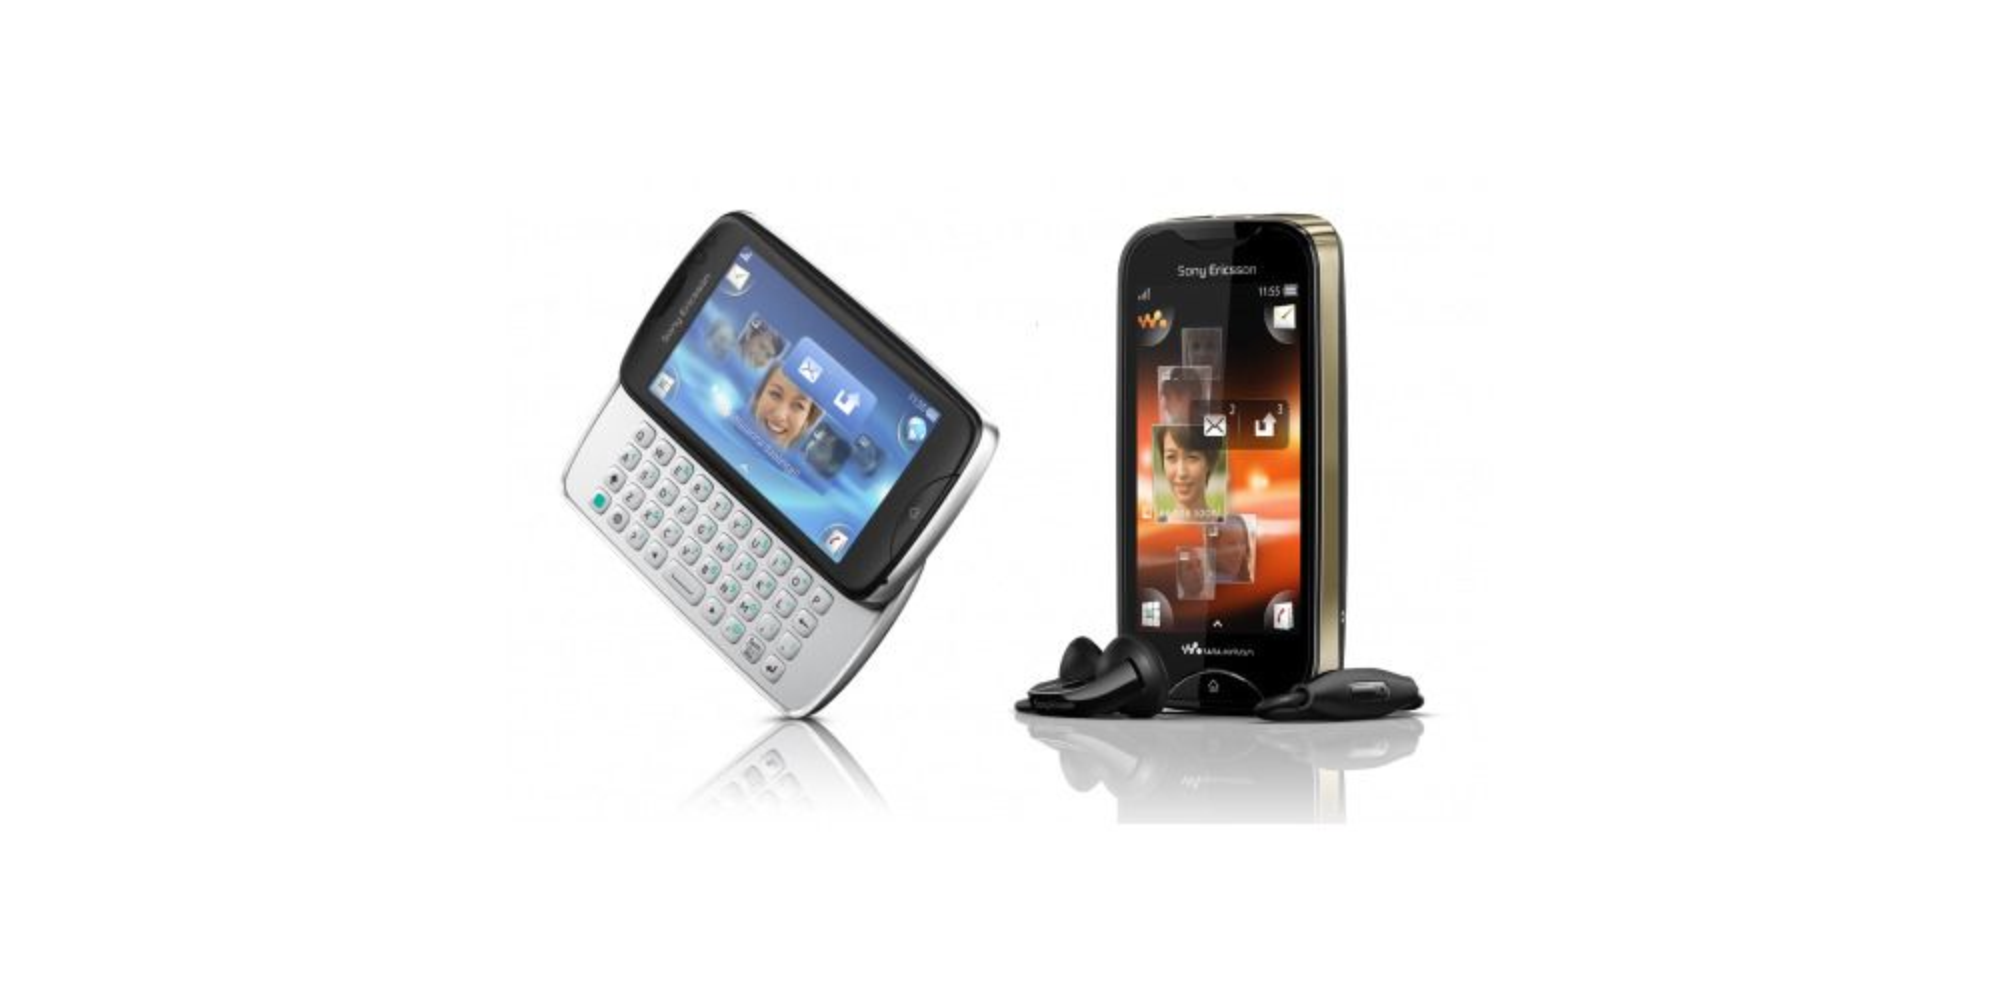 Sony Ericsson avduker txt pro og Mix Walkman